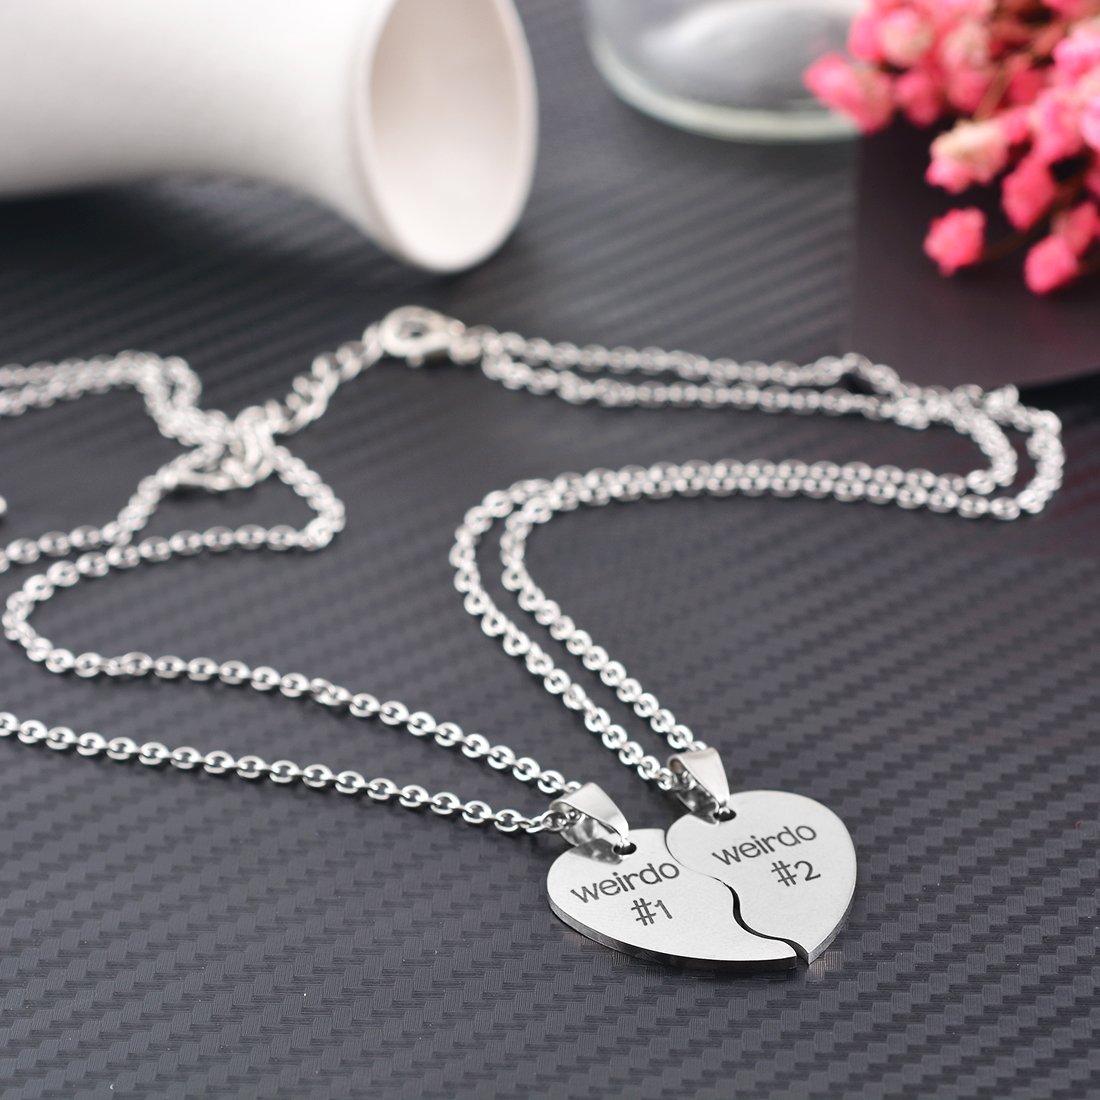 MJartoria BFF Necklaces for 2 Split Heart Weirdo 1 Weirdo 2 Best Friends Forever Pendant Friendship Set XIEHOU XHA1A1B2B2C3C5